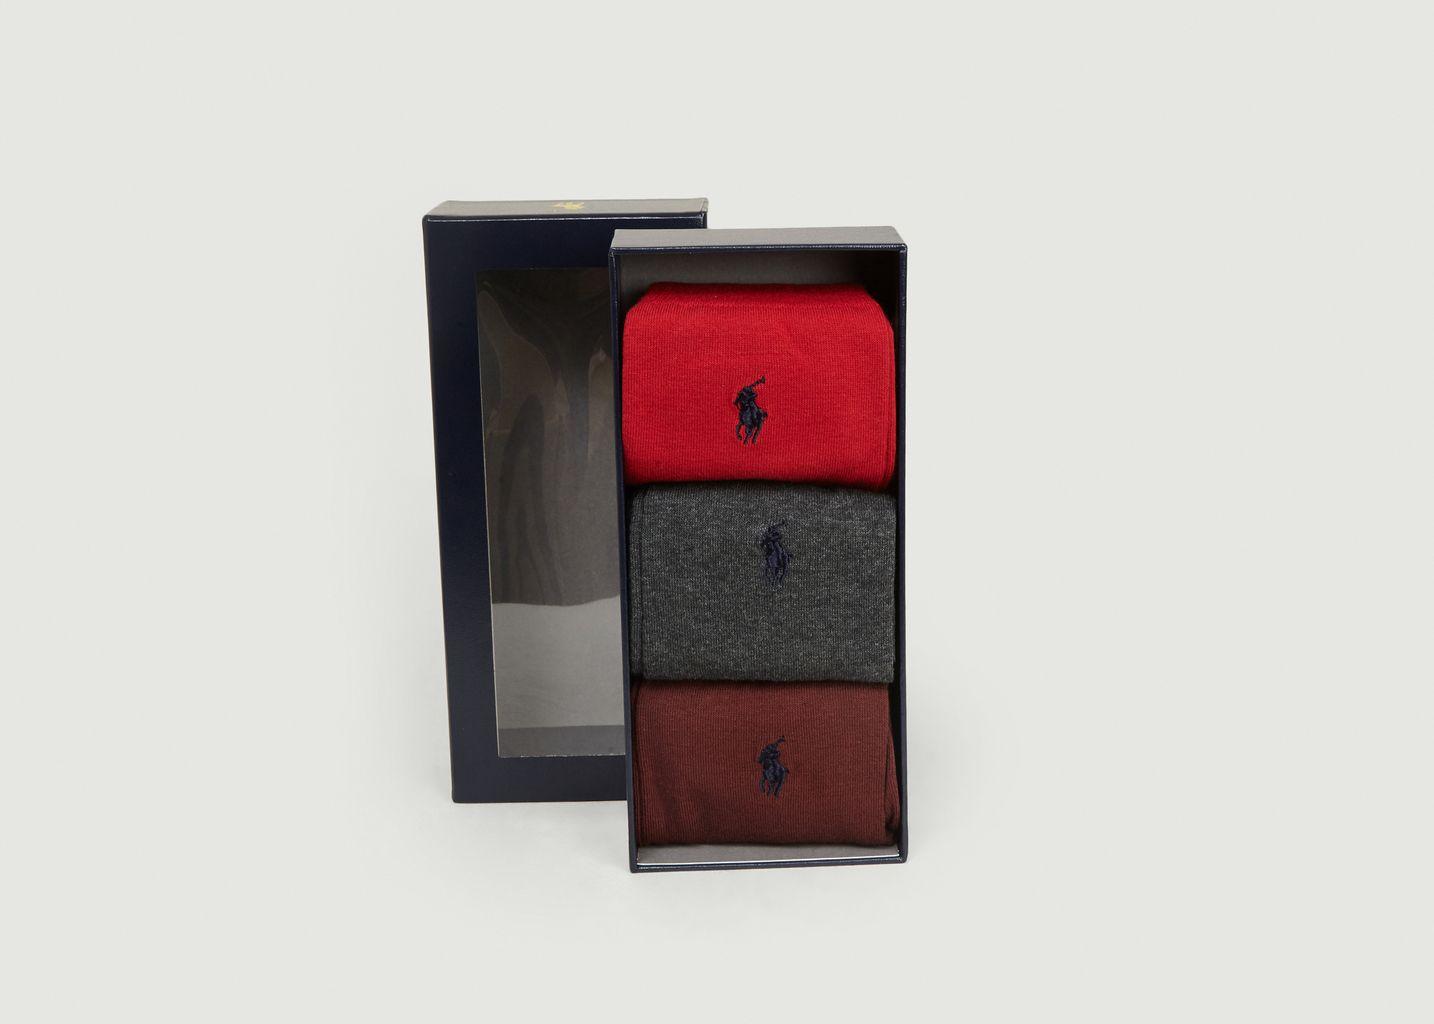 Chaussettes x3 - Polo Ralph Lauren